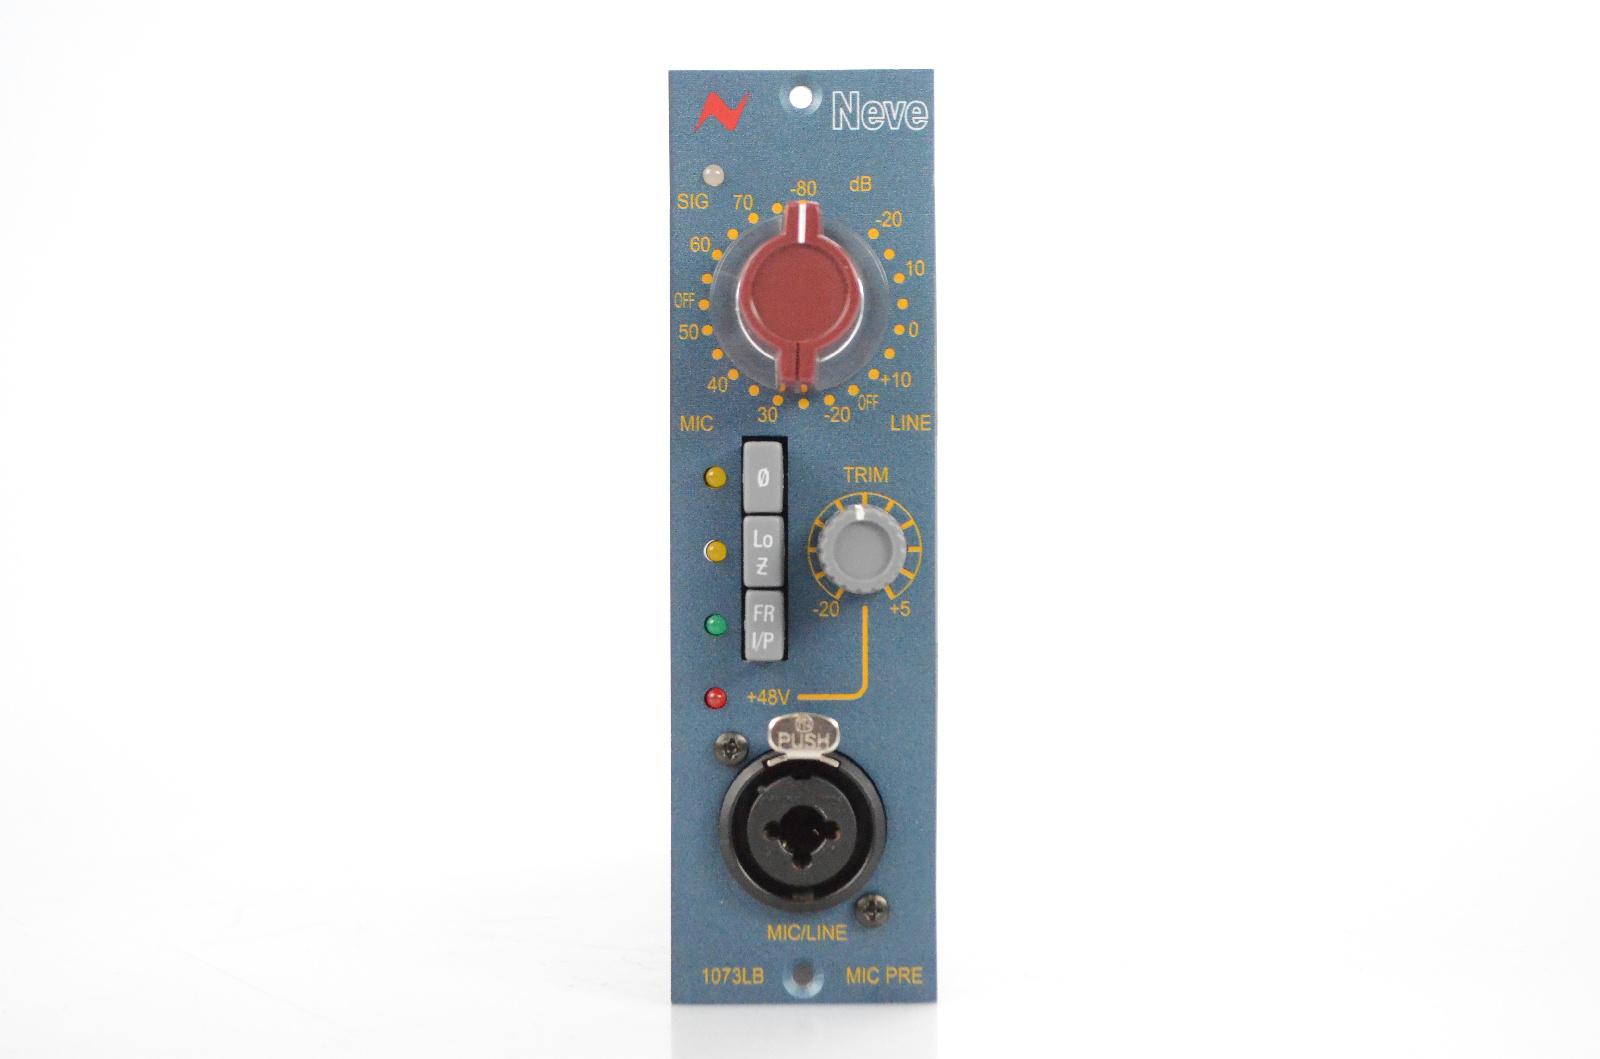 AMS Neve 1073LB 500 Series Line & Microphone Mic Preamp Pre 1073 LB #32297